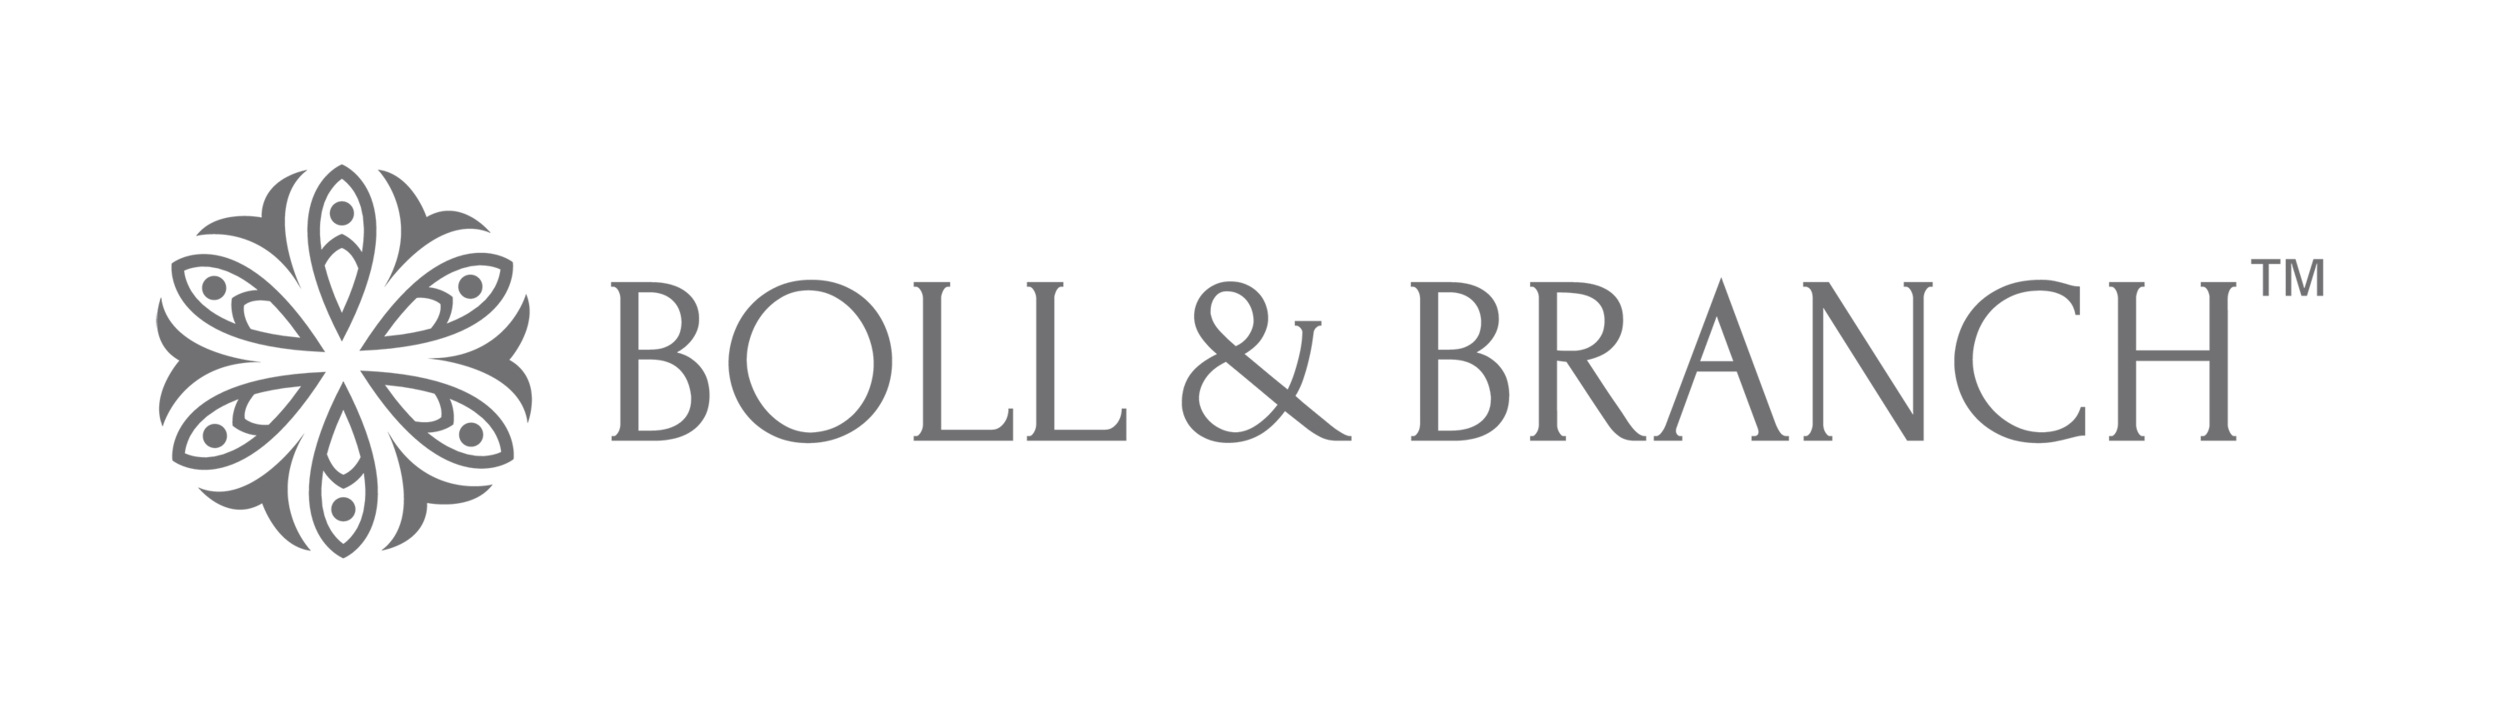 Boll-Branch-Client-Logo-4.jpg